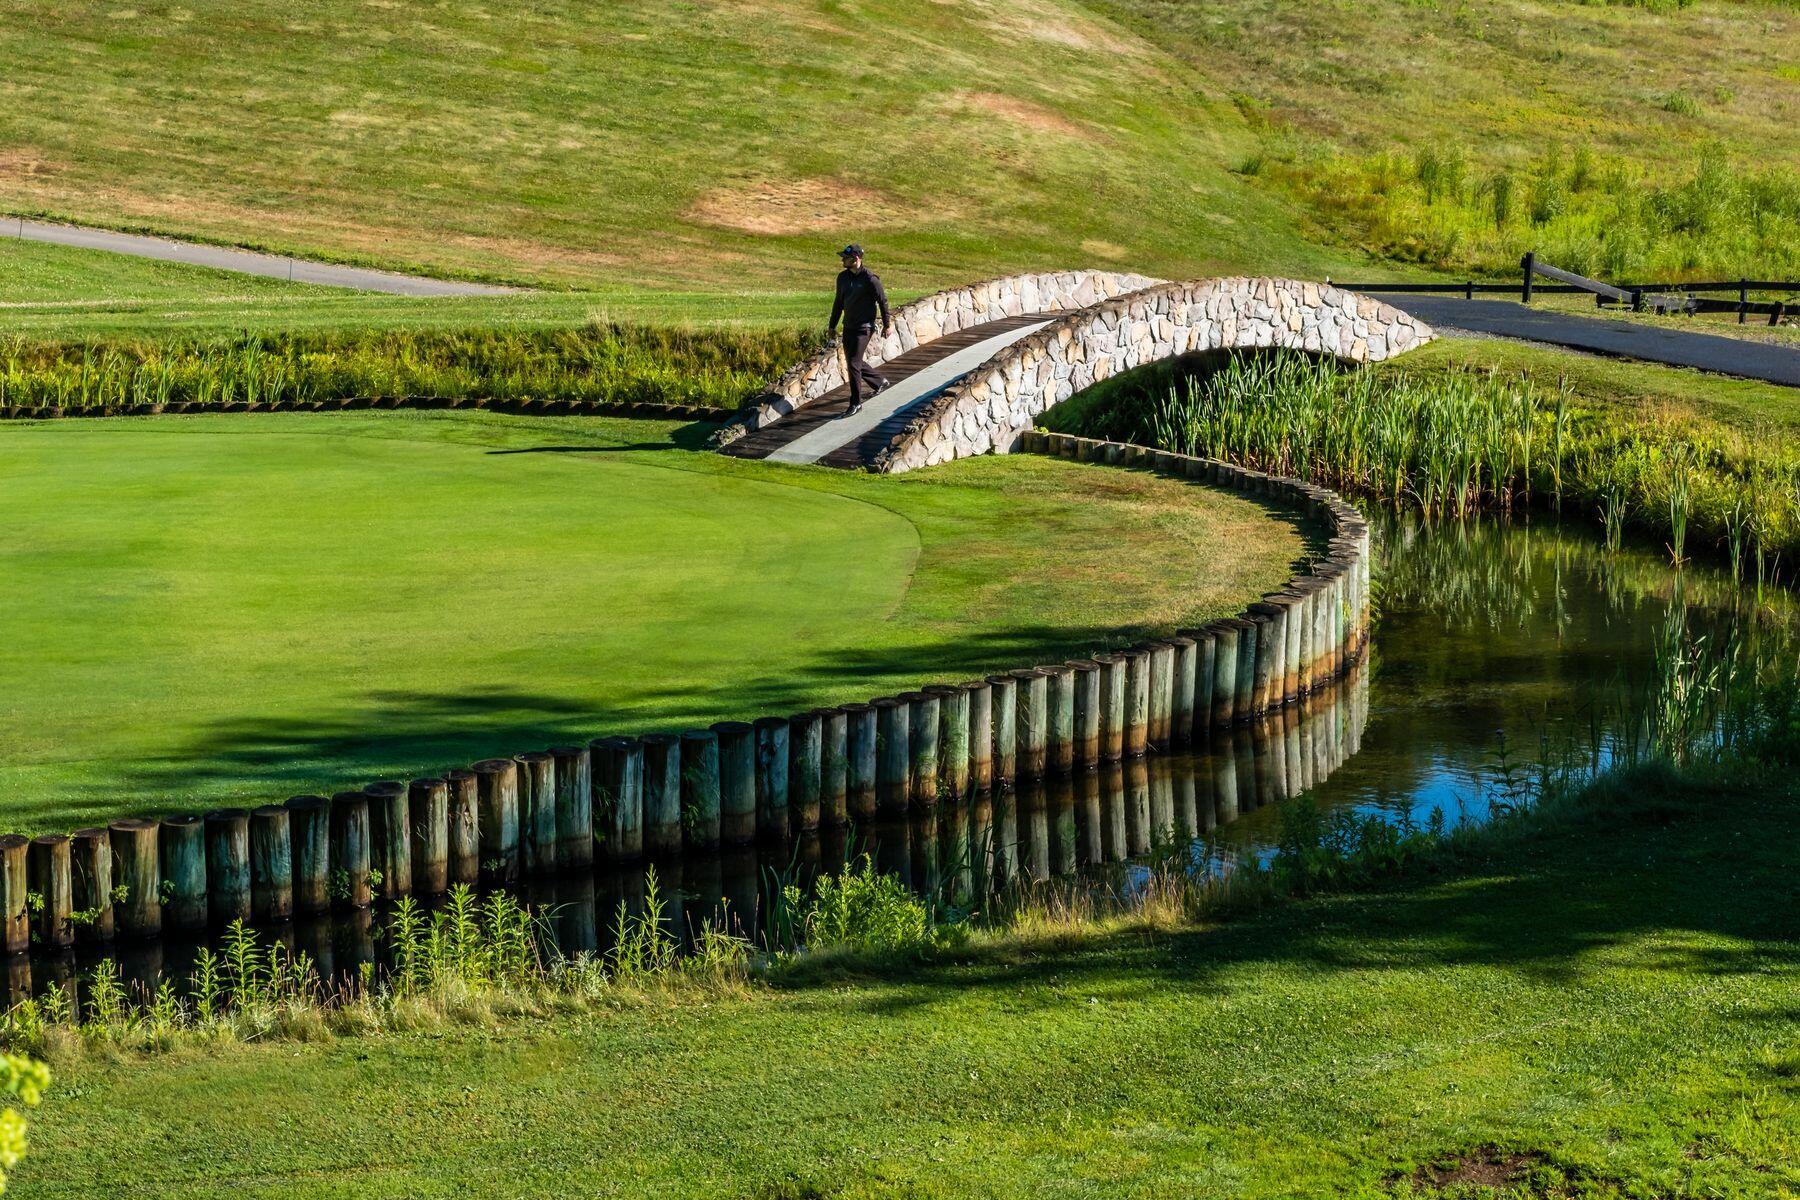 Man walking across a stone bridge on a golf course